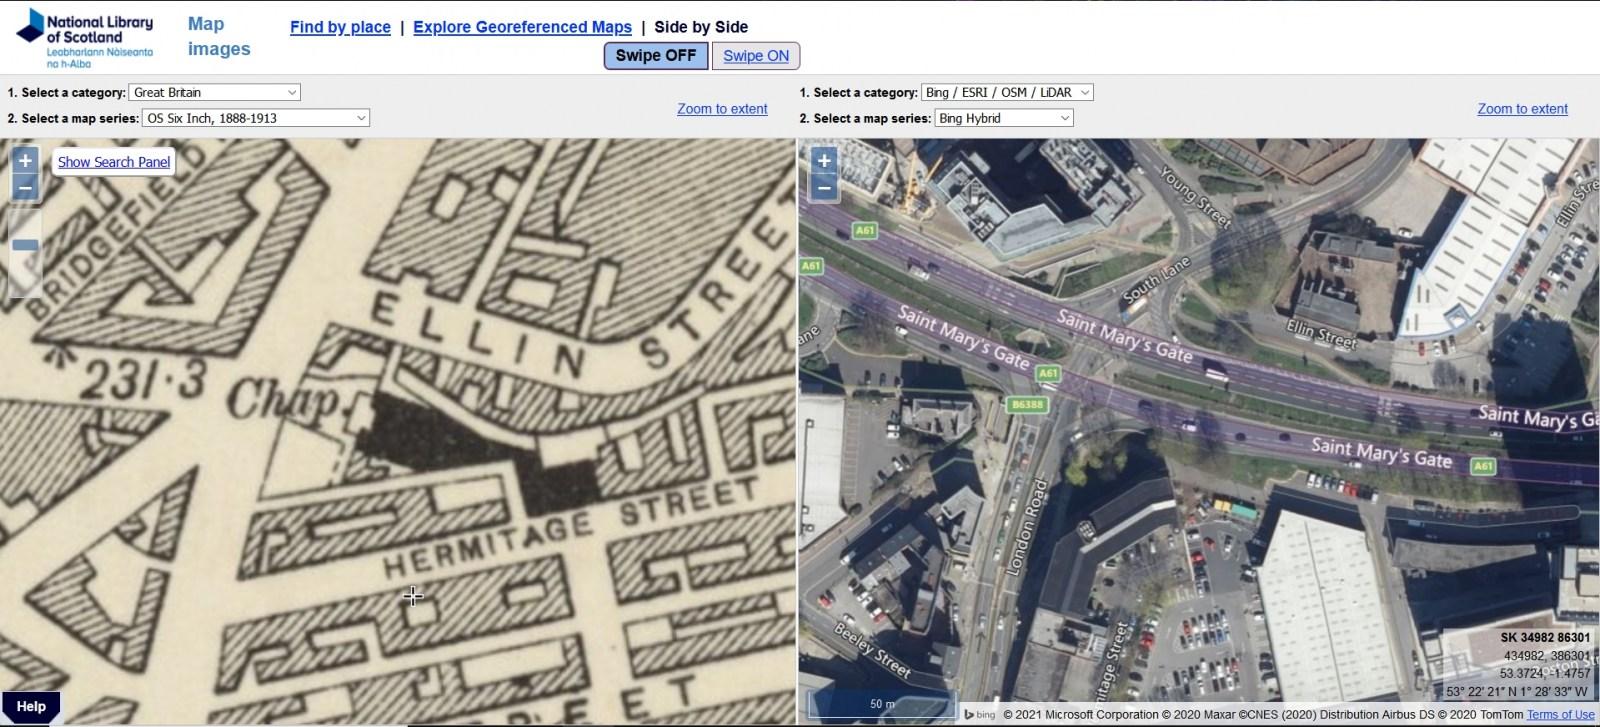 bruns_chap_map.jpg